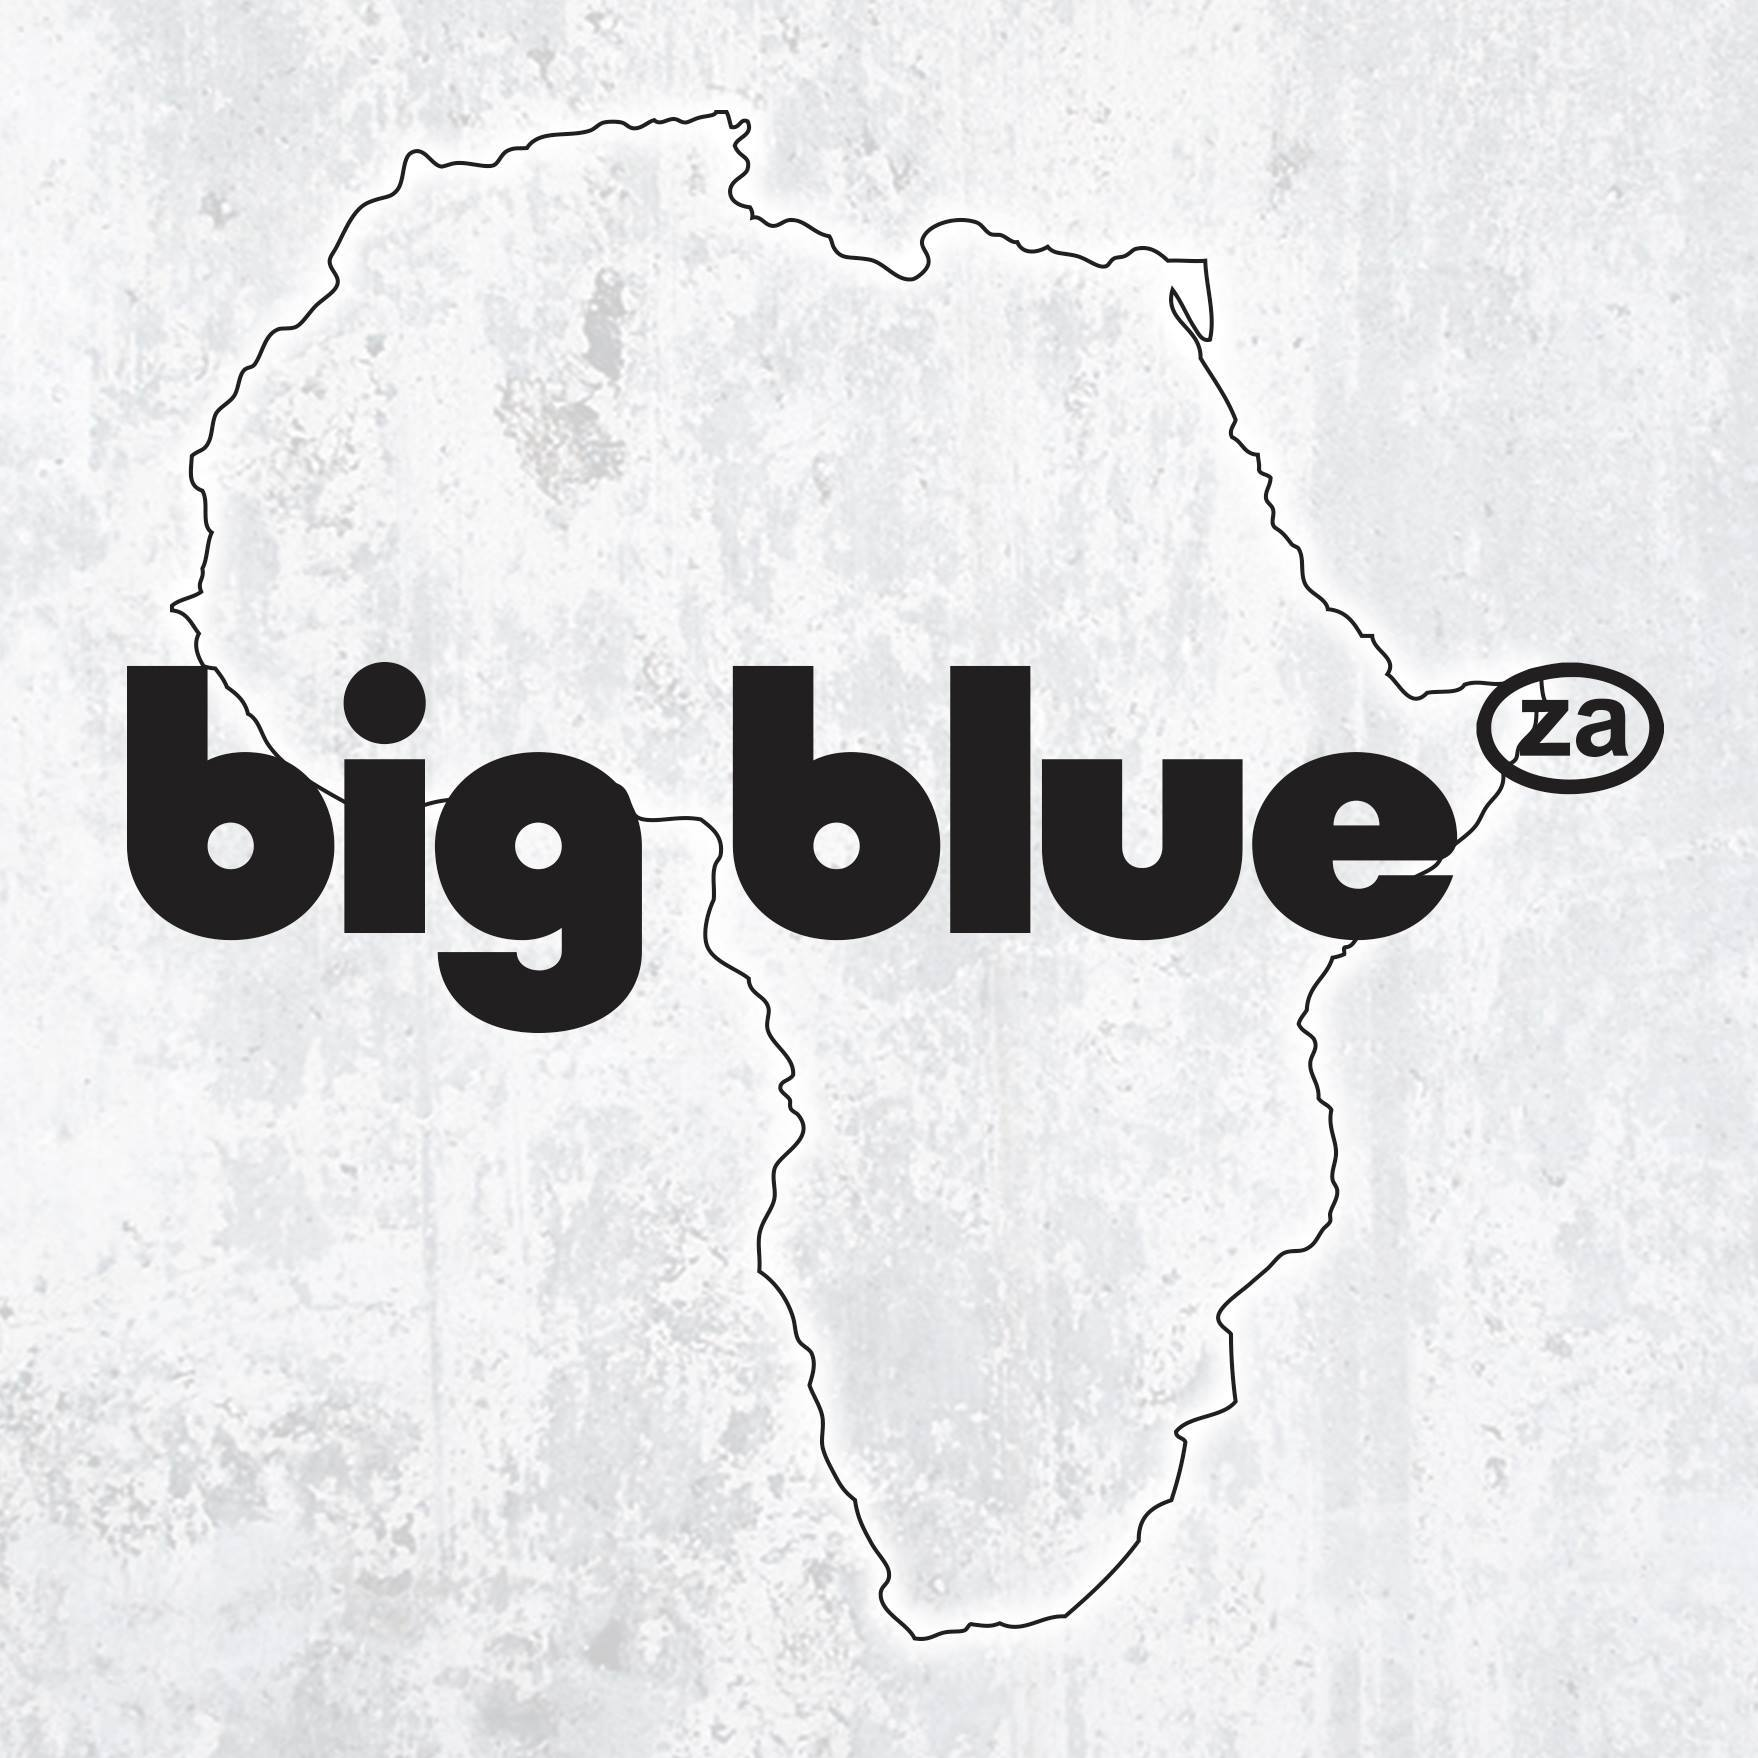 It's big and um blue… It's big blue!